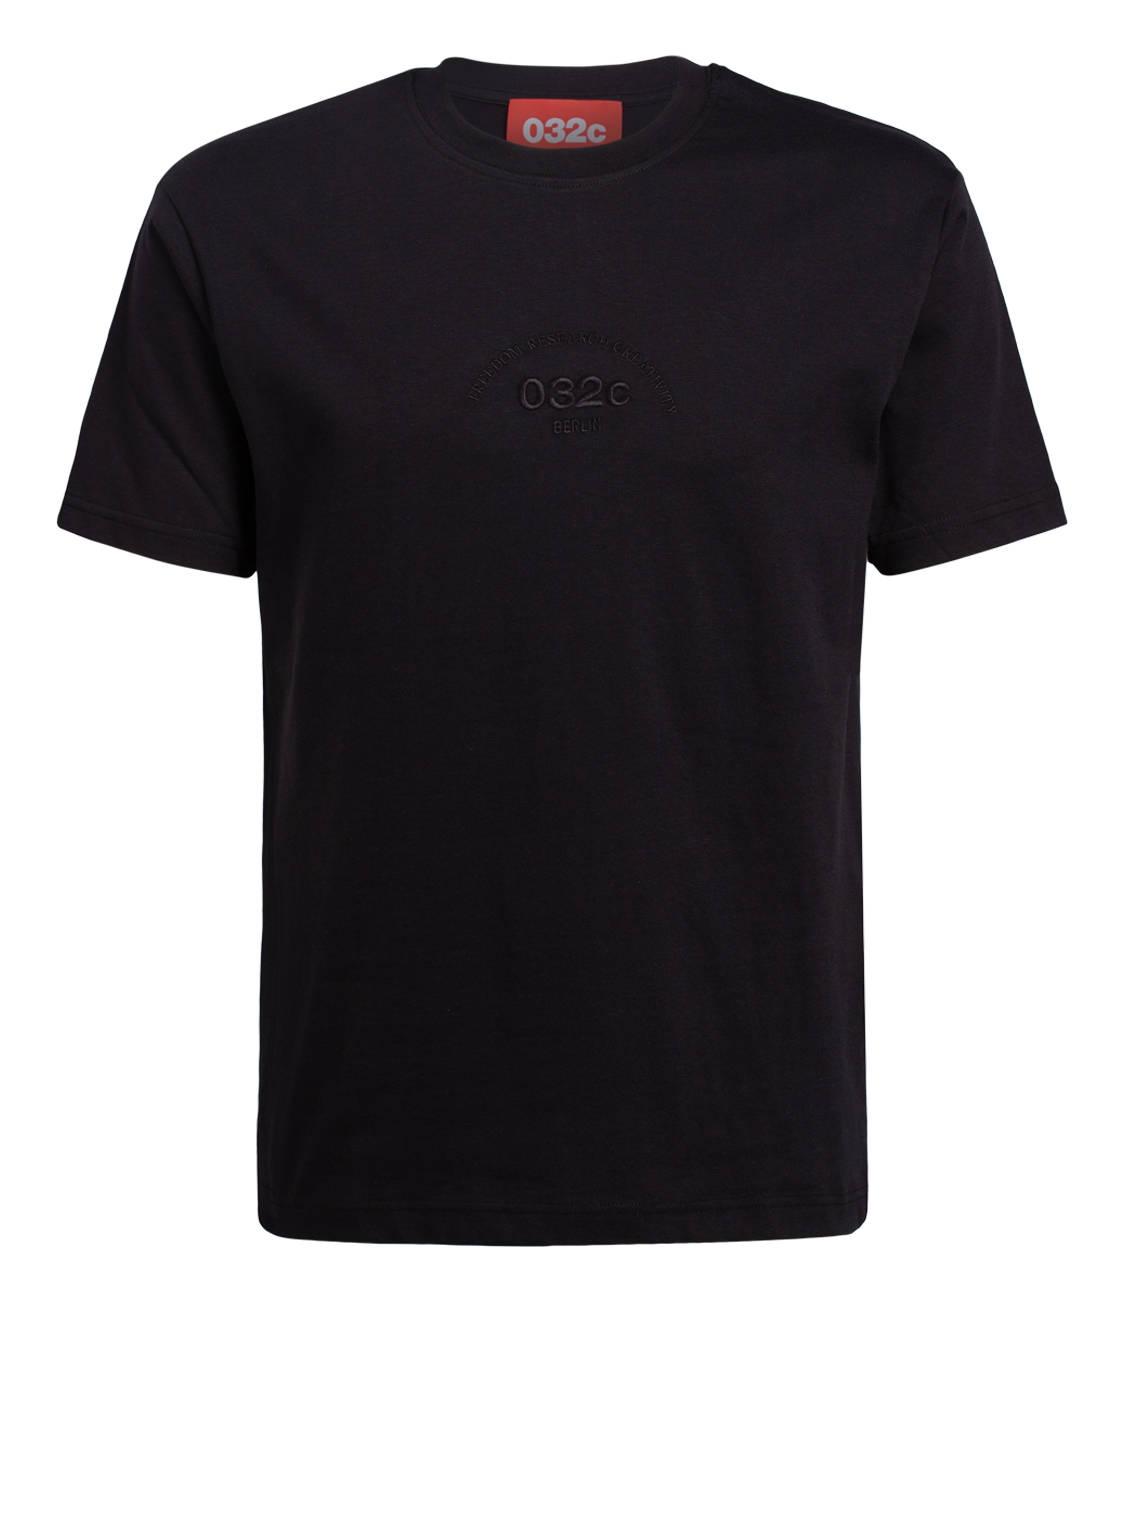 Image of 032c T-Shirt schwarz